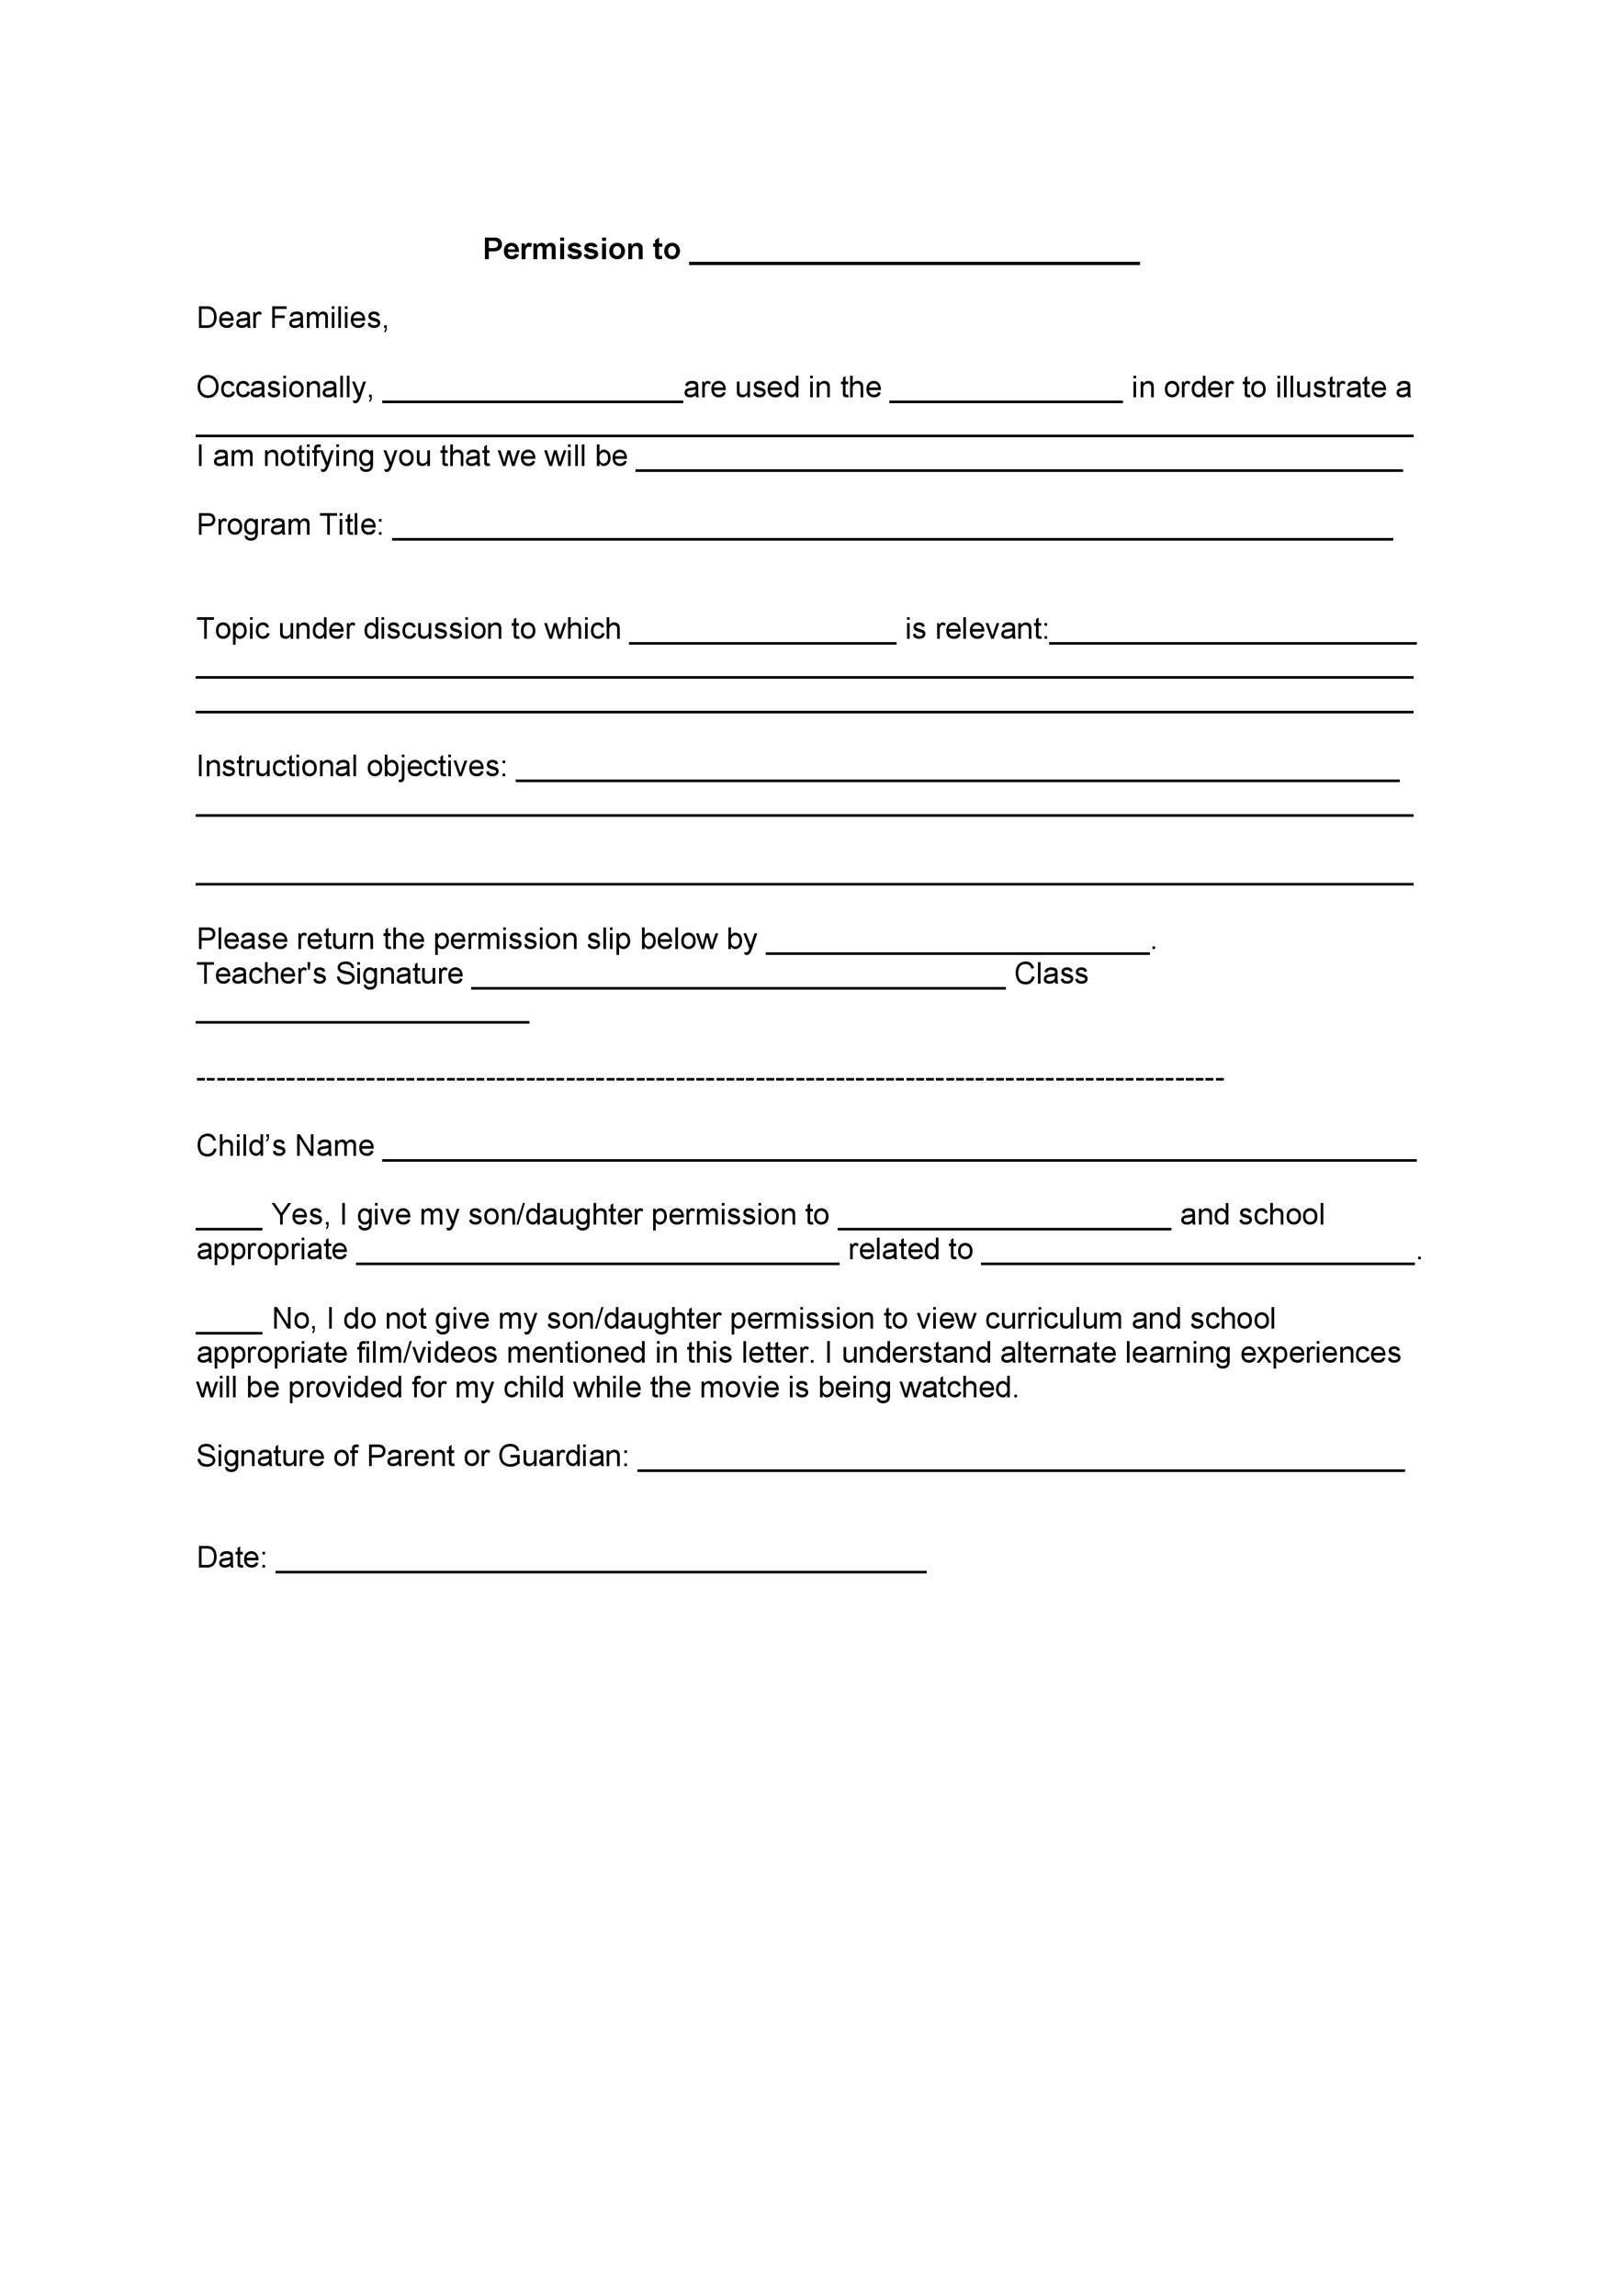 how to send somone a document through dochub